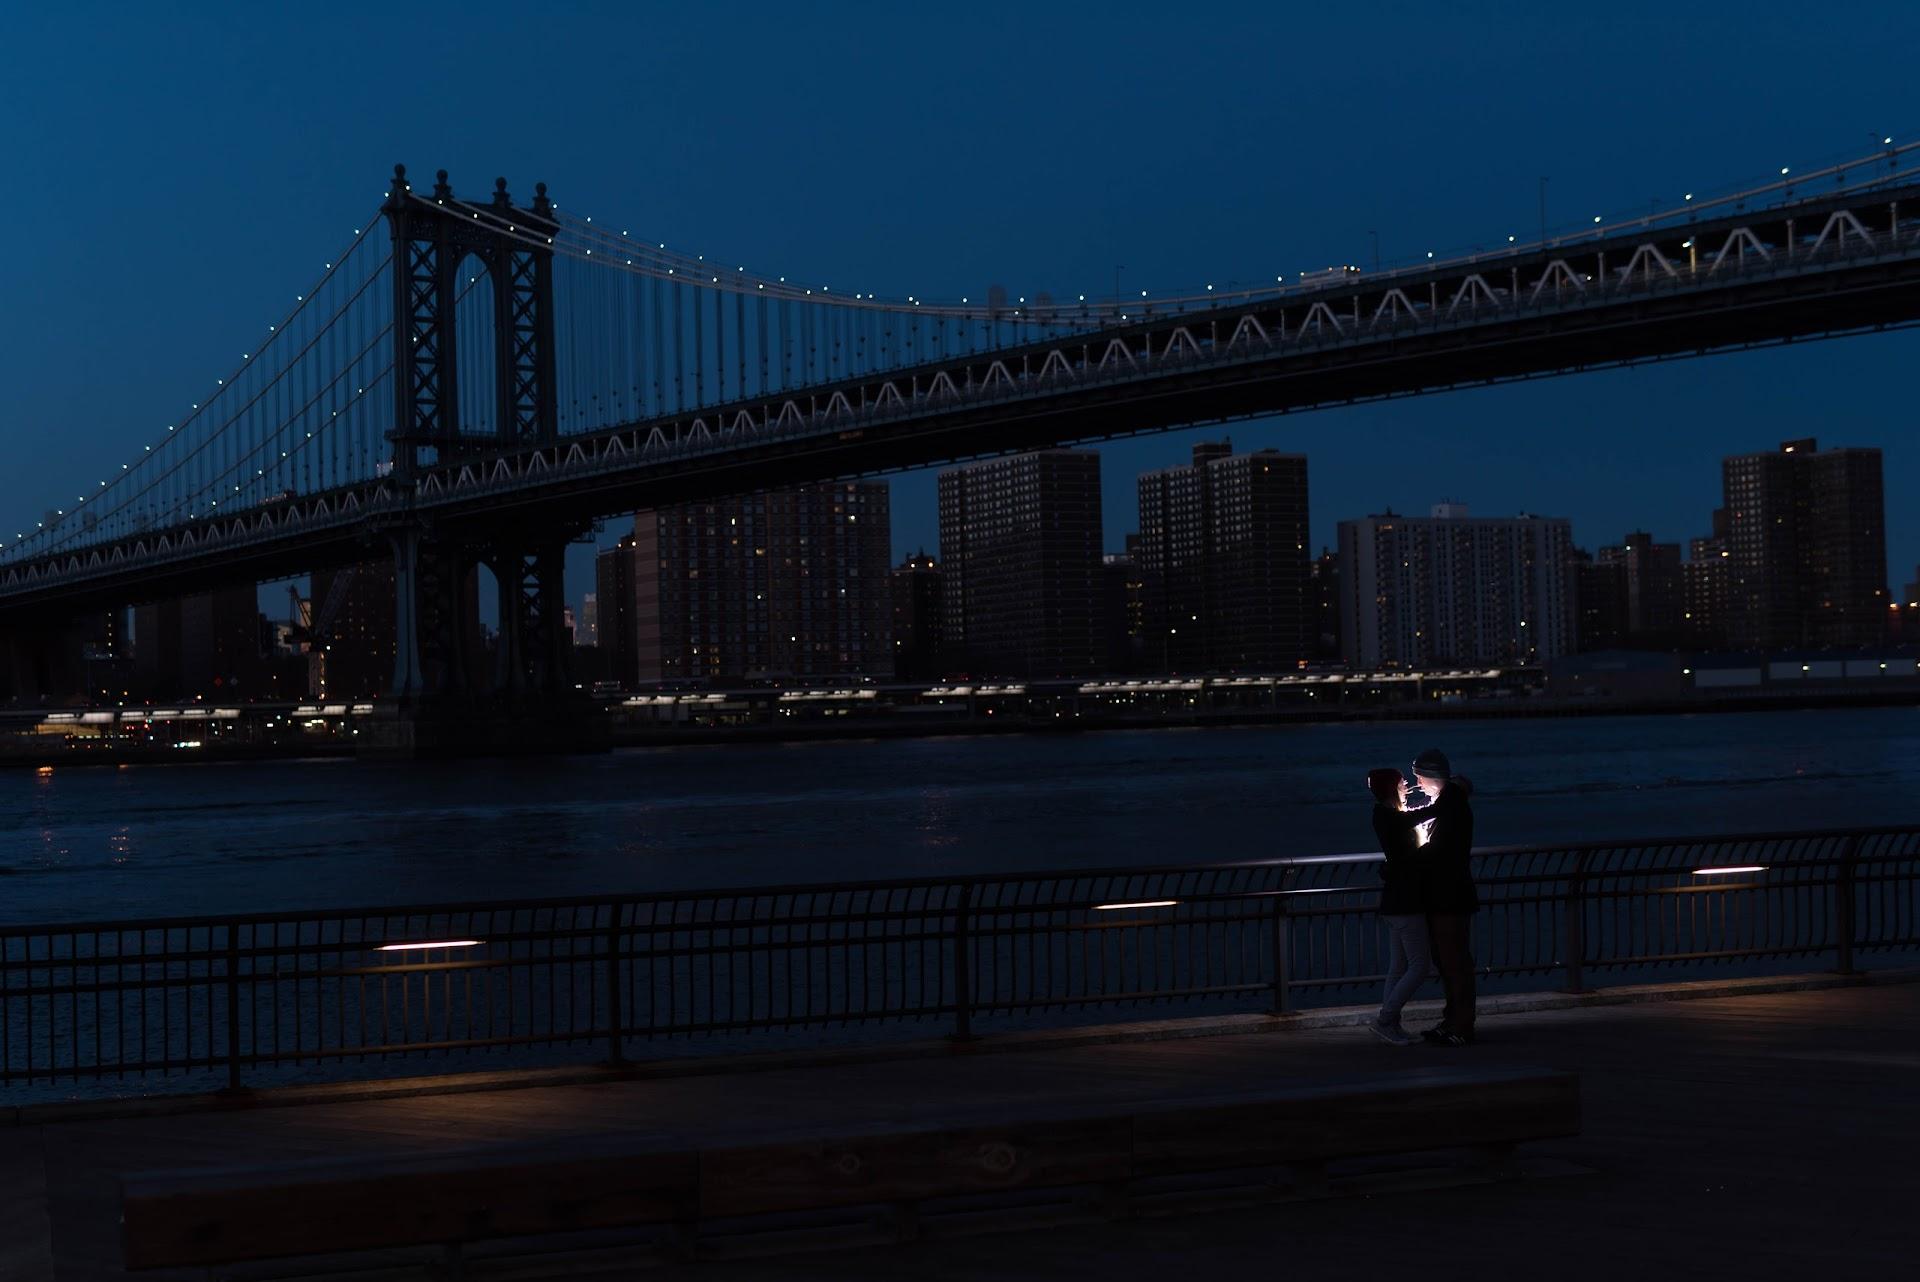 photography, engagements, couple, photography shoot, popular photo spots in nyc, brooklyn, new york, dumbo, manhattan bridge, brooklyn bridge, night, lights, nighttime, flash,